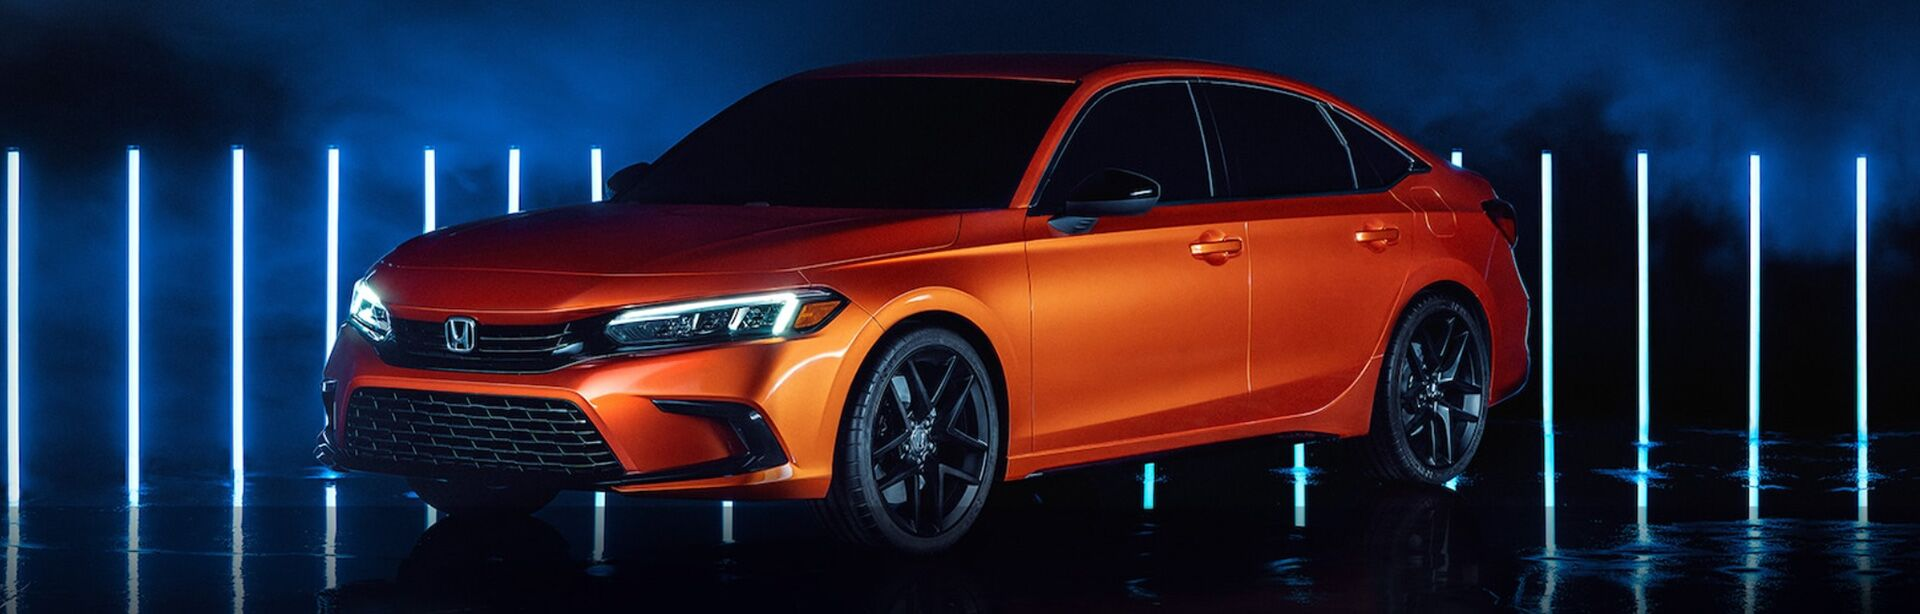 Coming Soon: The 2022 Honda Civic